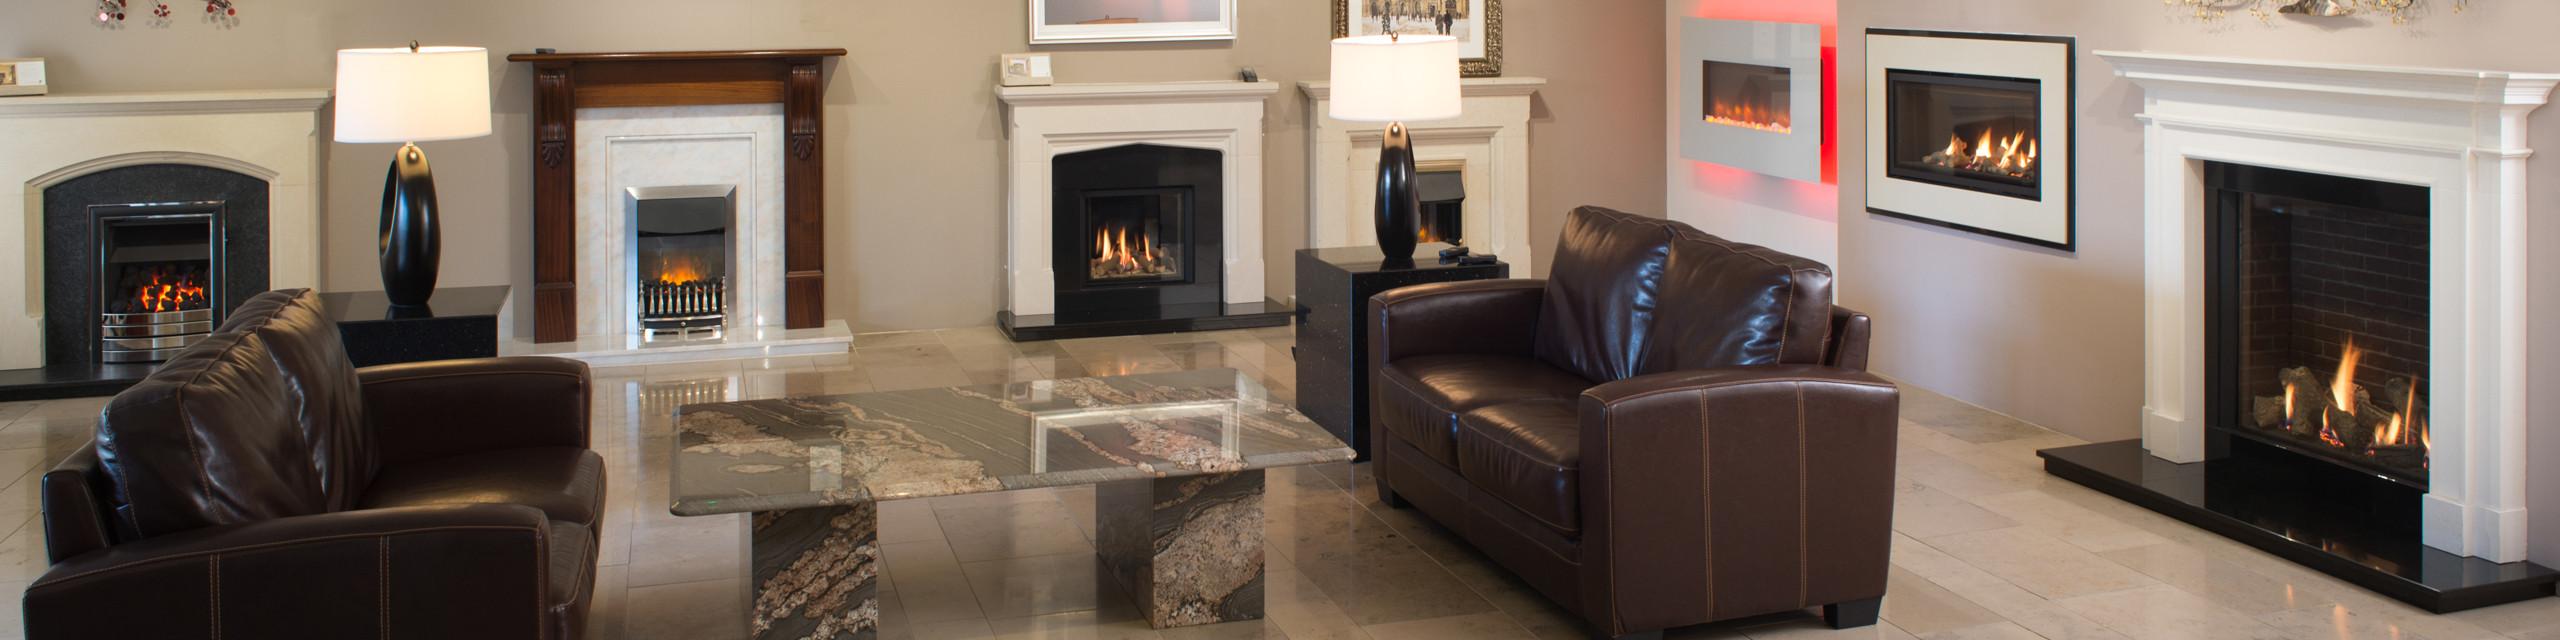 fireplace_banner.2560x640